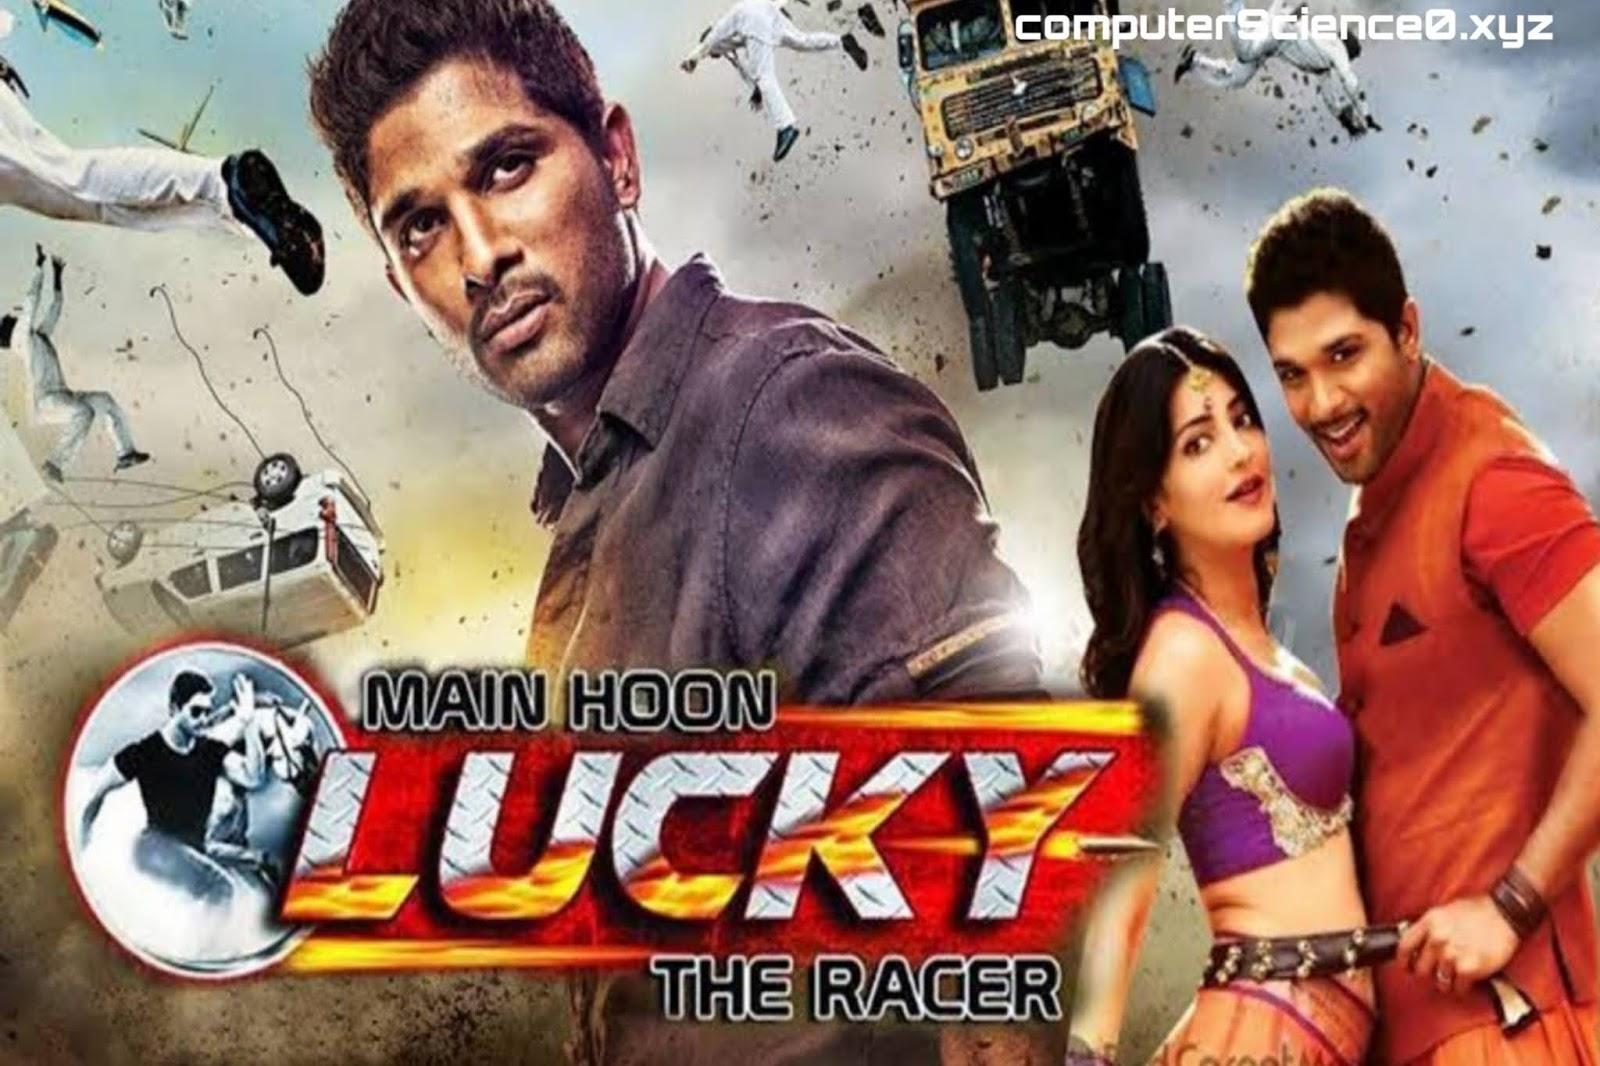 Race Gurram, Main Hoon Lucky The Racer Allu Arjun's Top 19 movies of all time